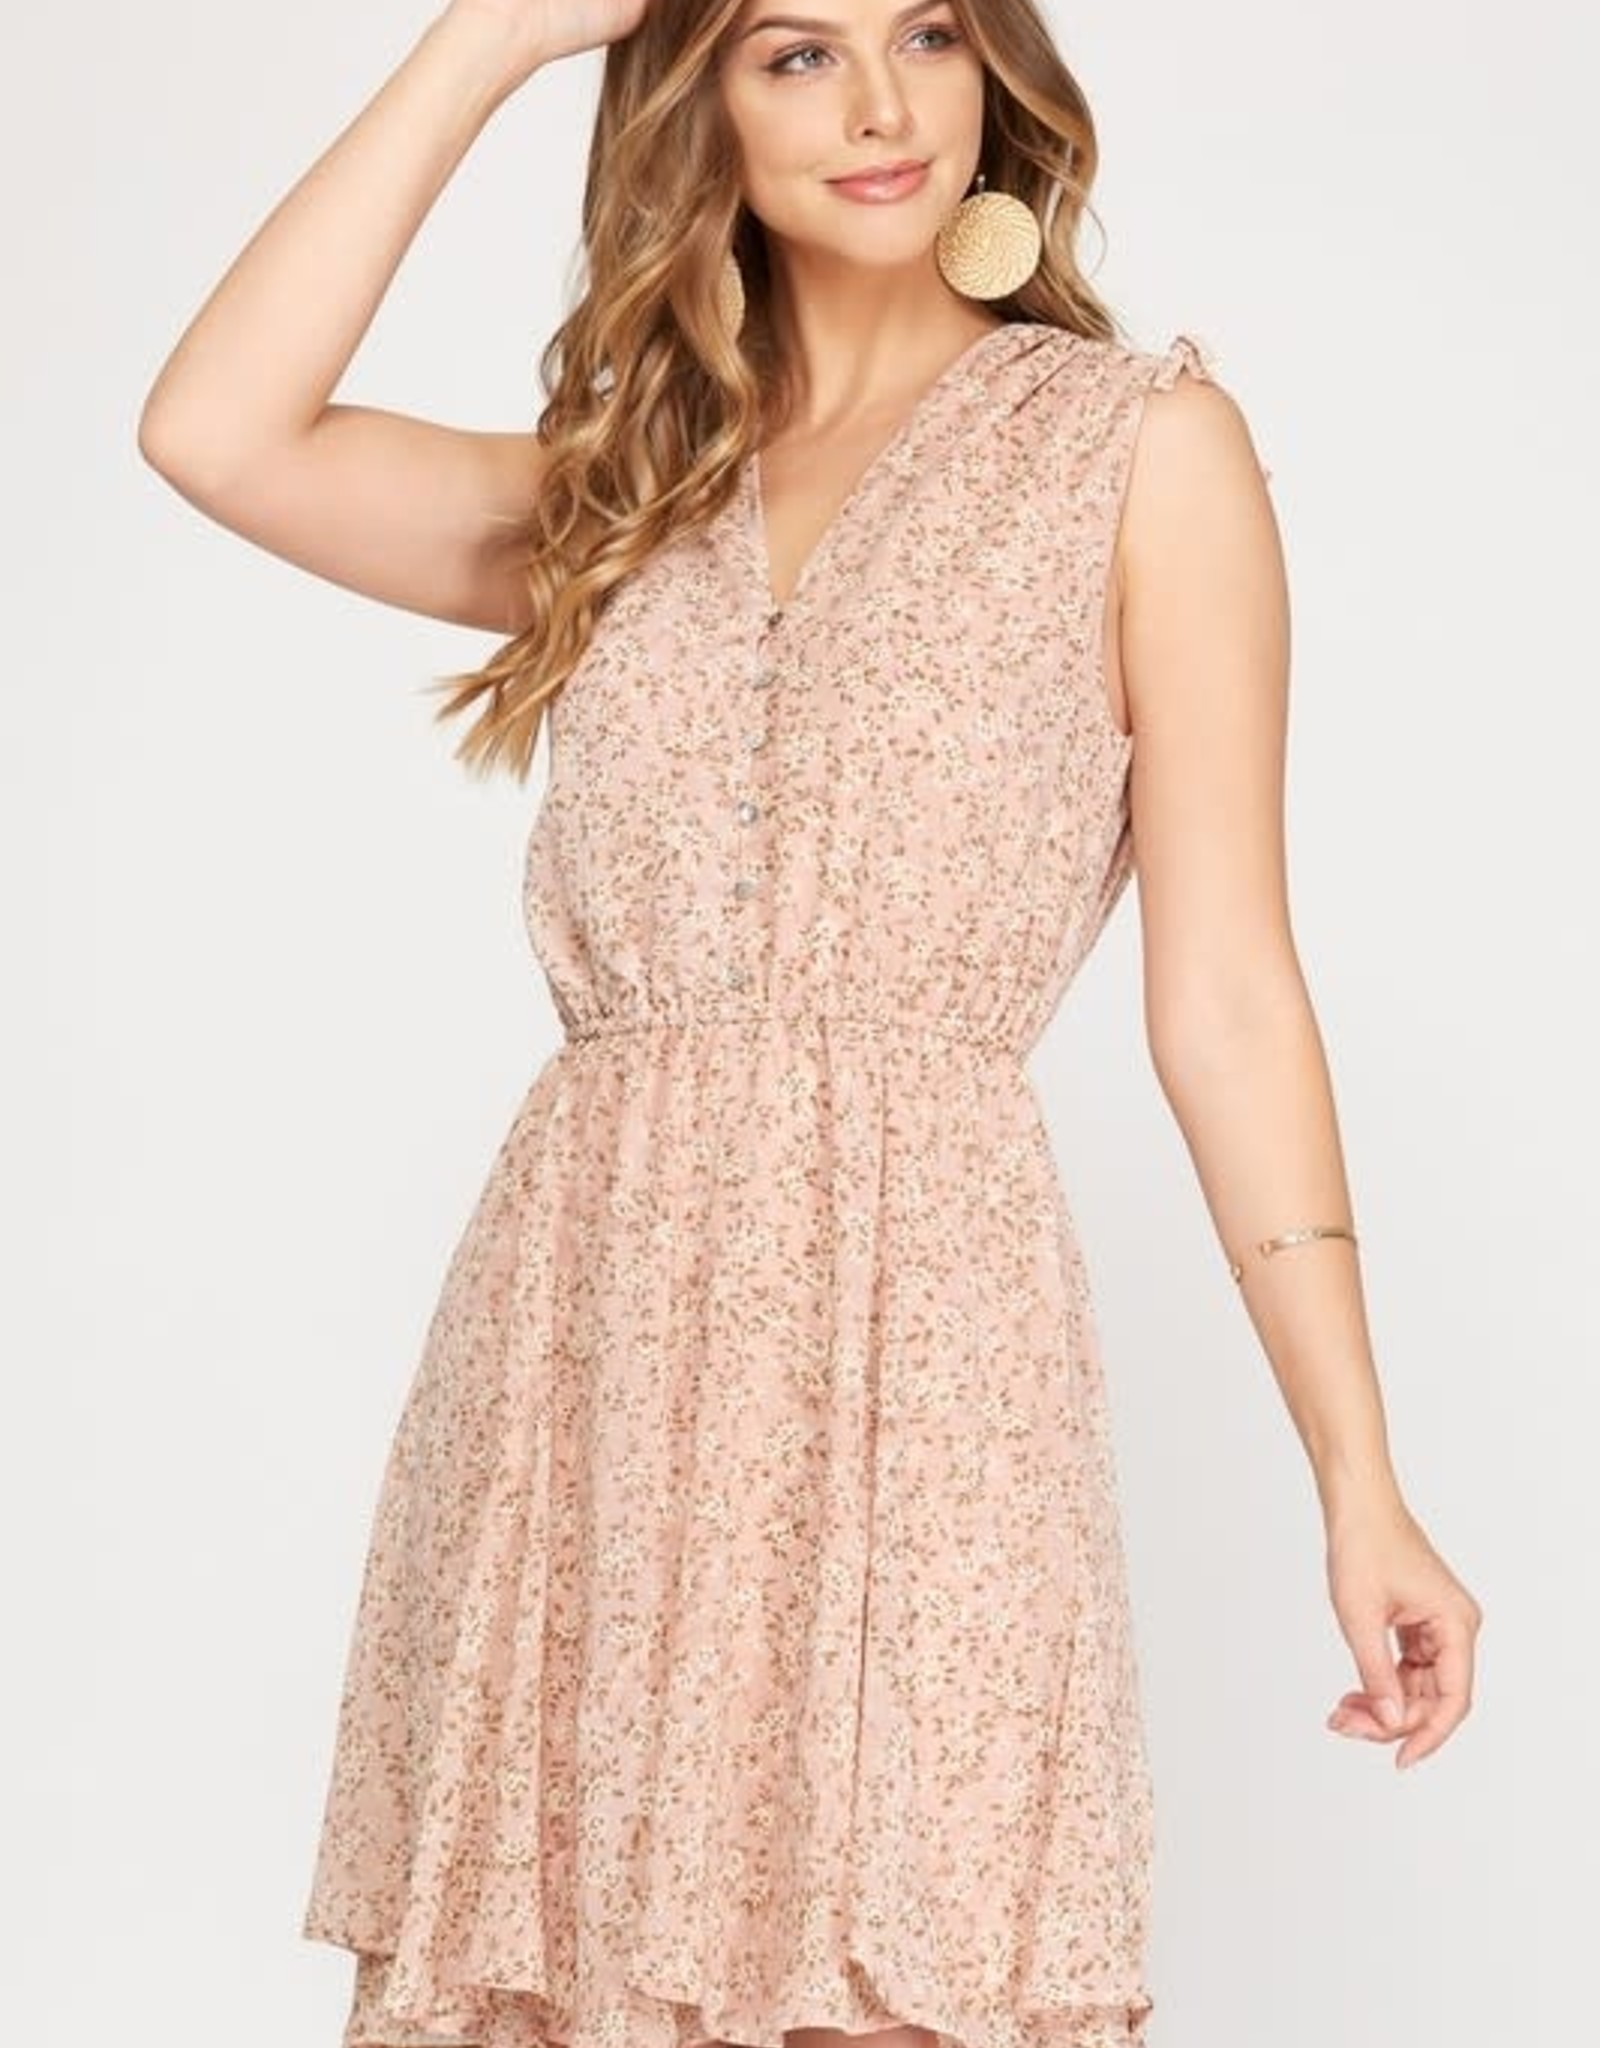 Miss Bliss Slvls Drawstring Printed Dress- Rose